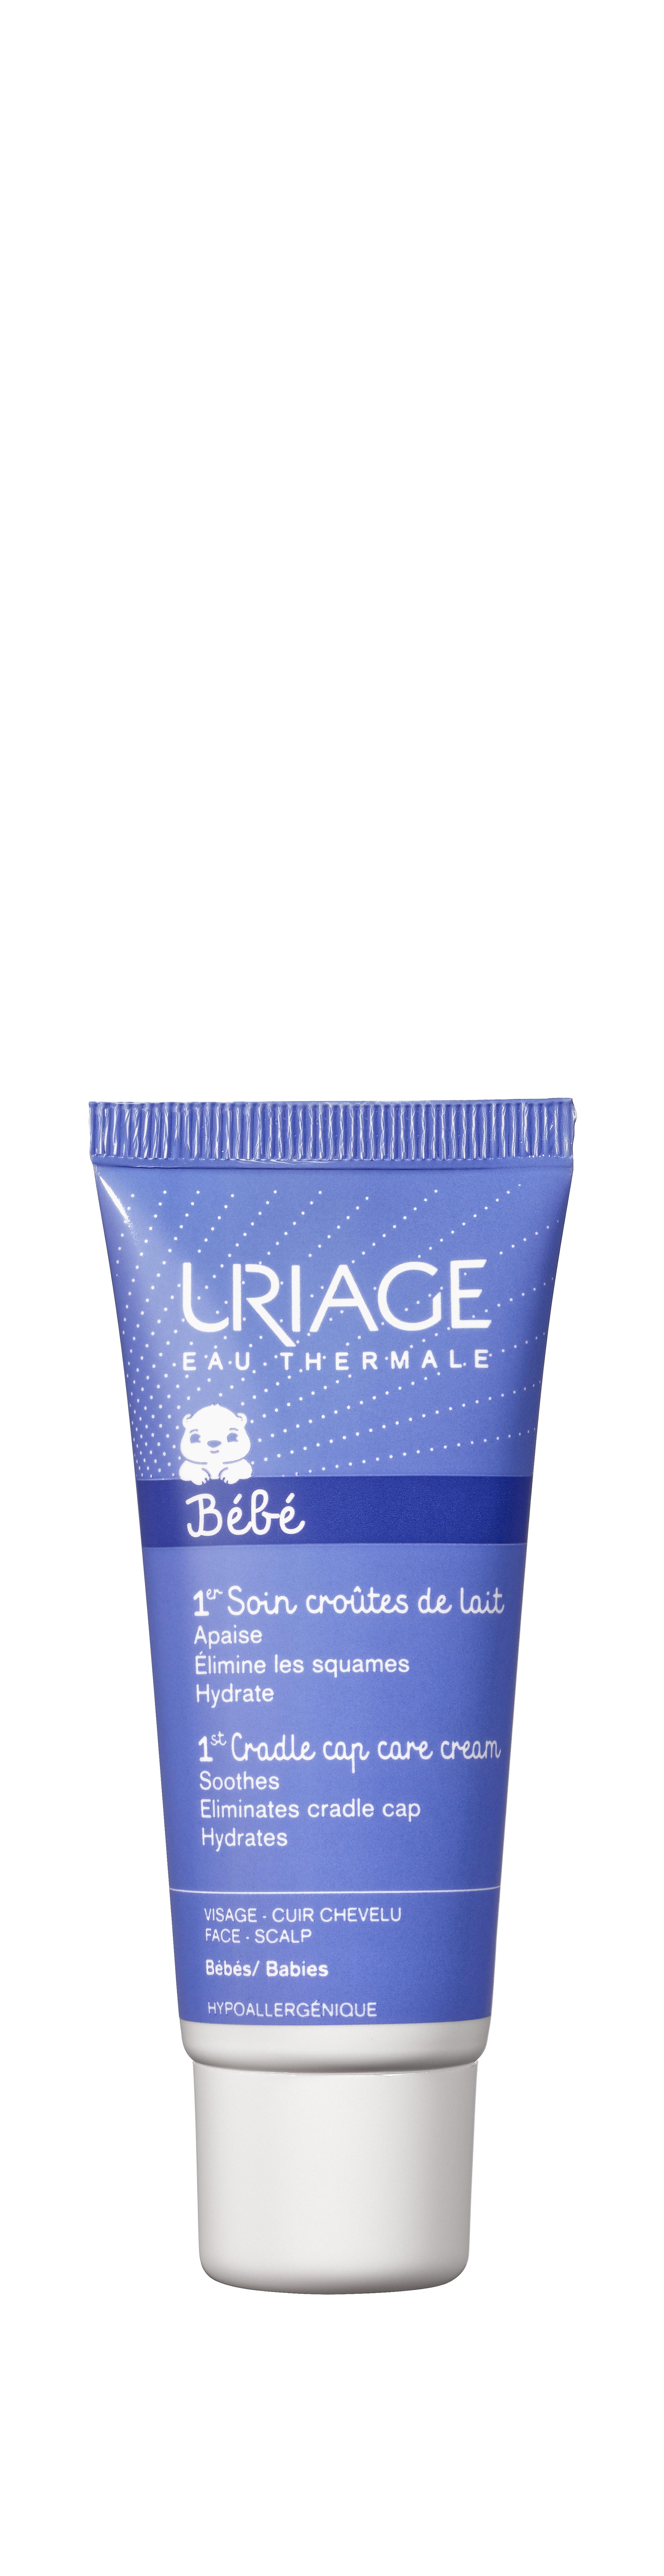 Image URIAGE BEBE 1ER SOIN Cr soin croûtes de lait T/40ml